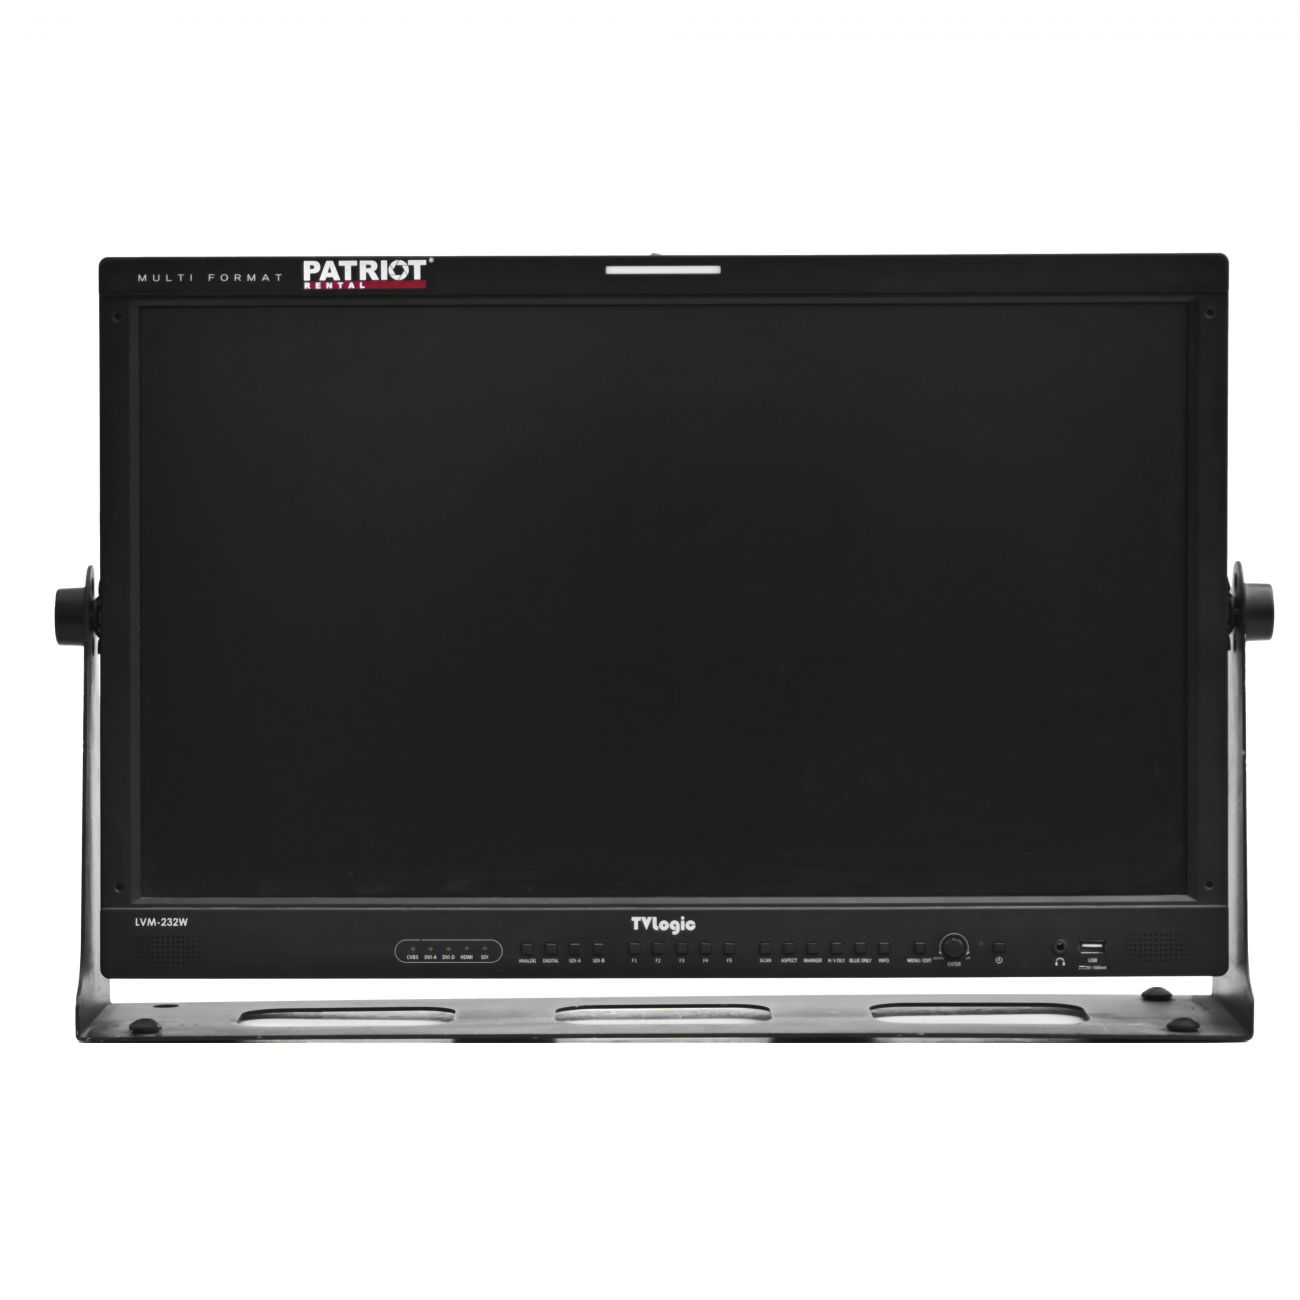 Monitor 23″ TV Logic  HDLCD LVM-232W